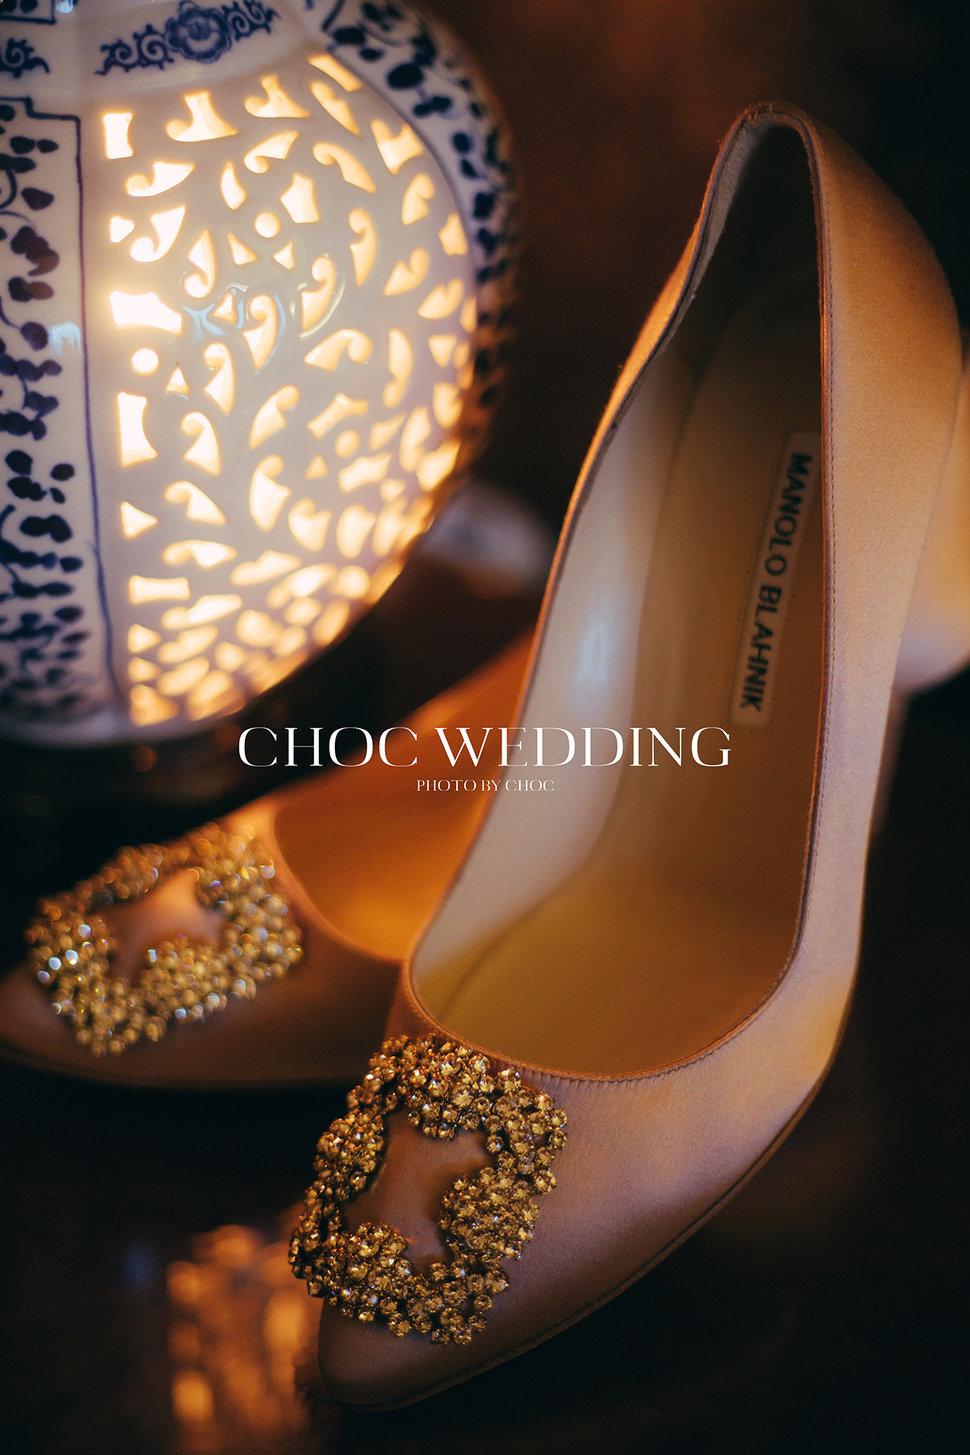 _25P0944 - CHOC wedding《結婚吧》